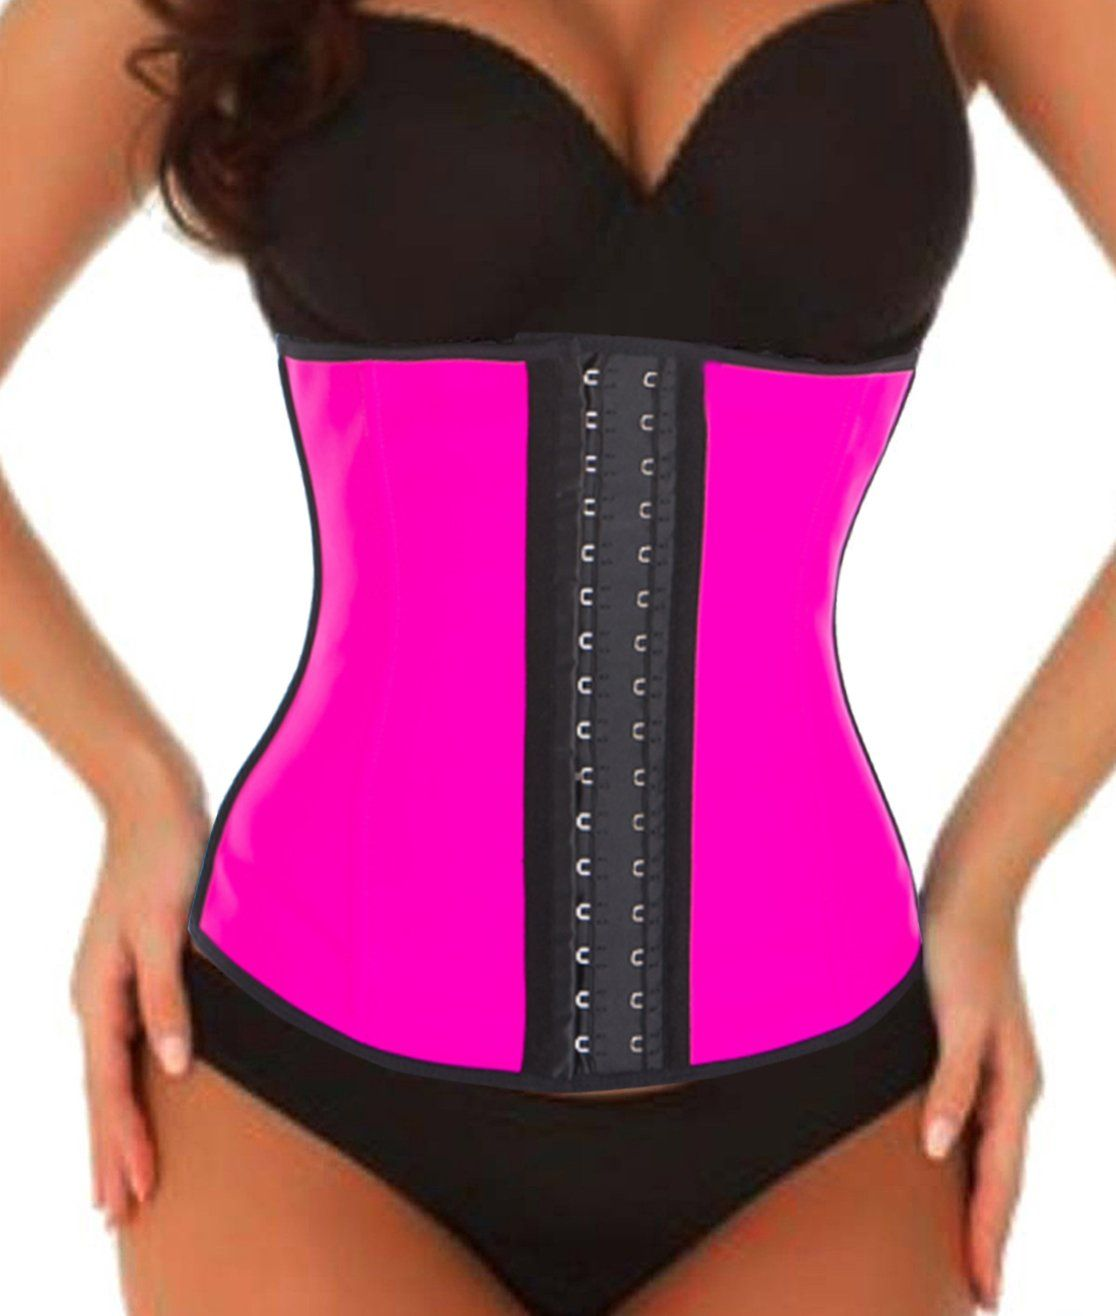 4cba3669bb Sexy Waist Trainer Waist Cincher Corset Body Shaper Shapewear Tummy Control  Underwear Vest Sauna Suit Underbust Bodysuit for Woman Man Weight Loss  Workout ...